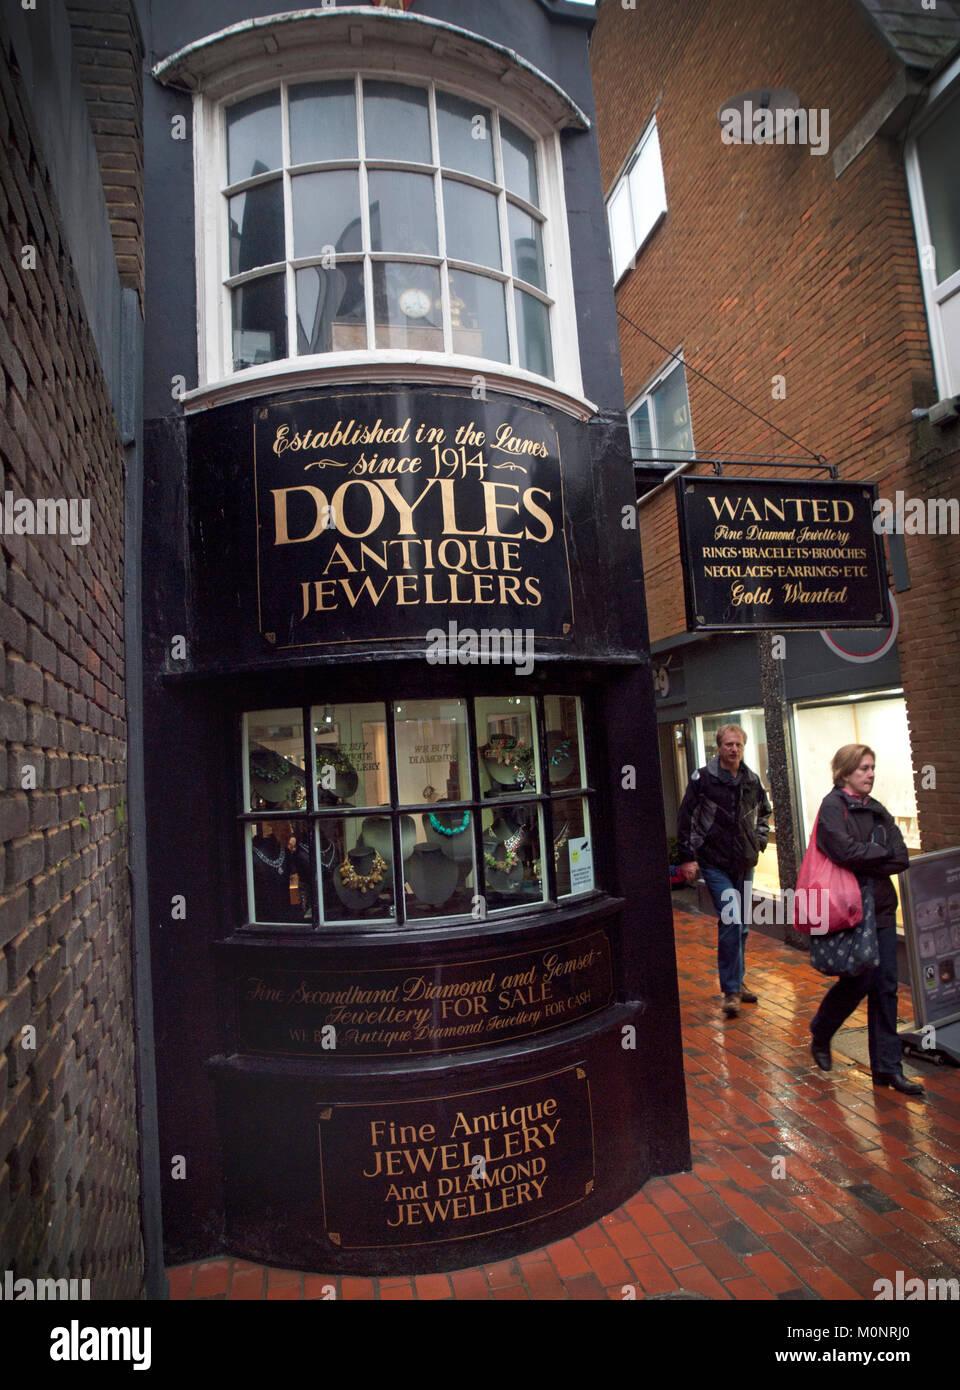 Doyles jewellery shop in the Lanes, Brighton Stock Photo